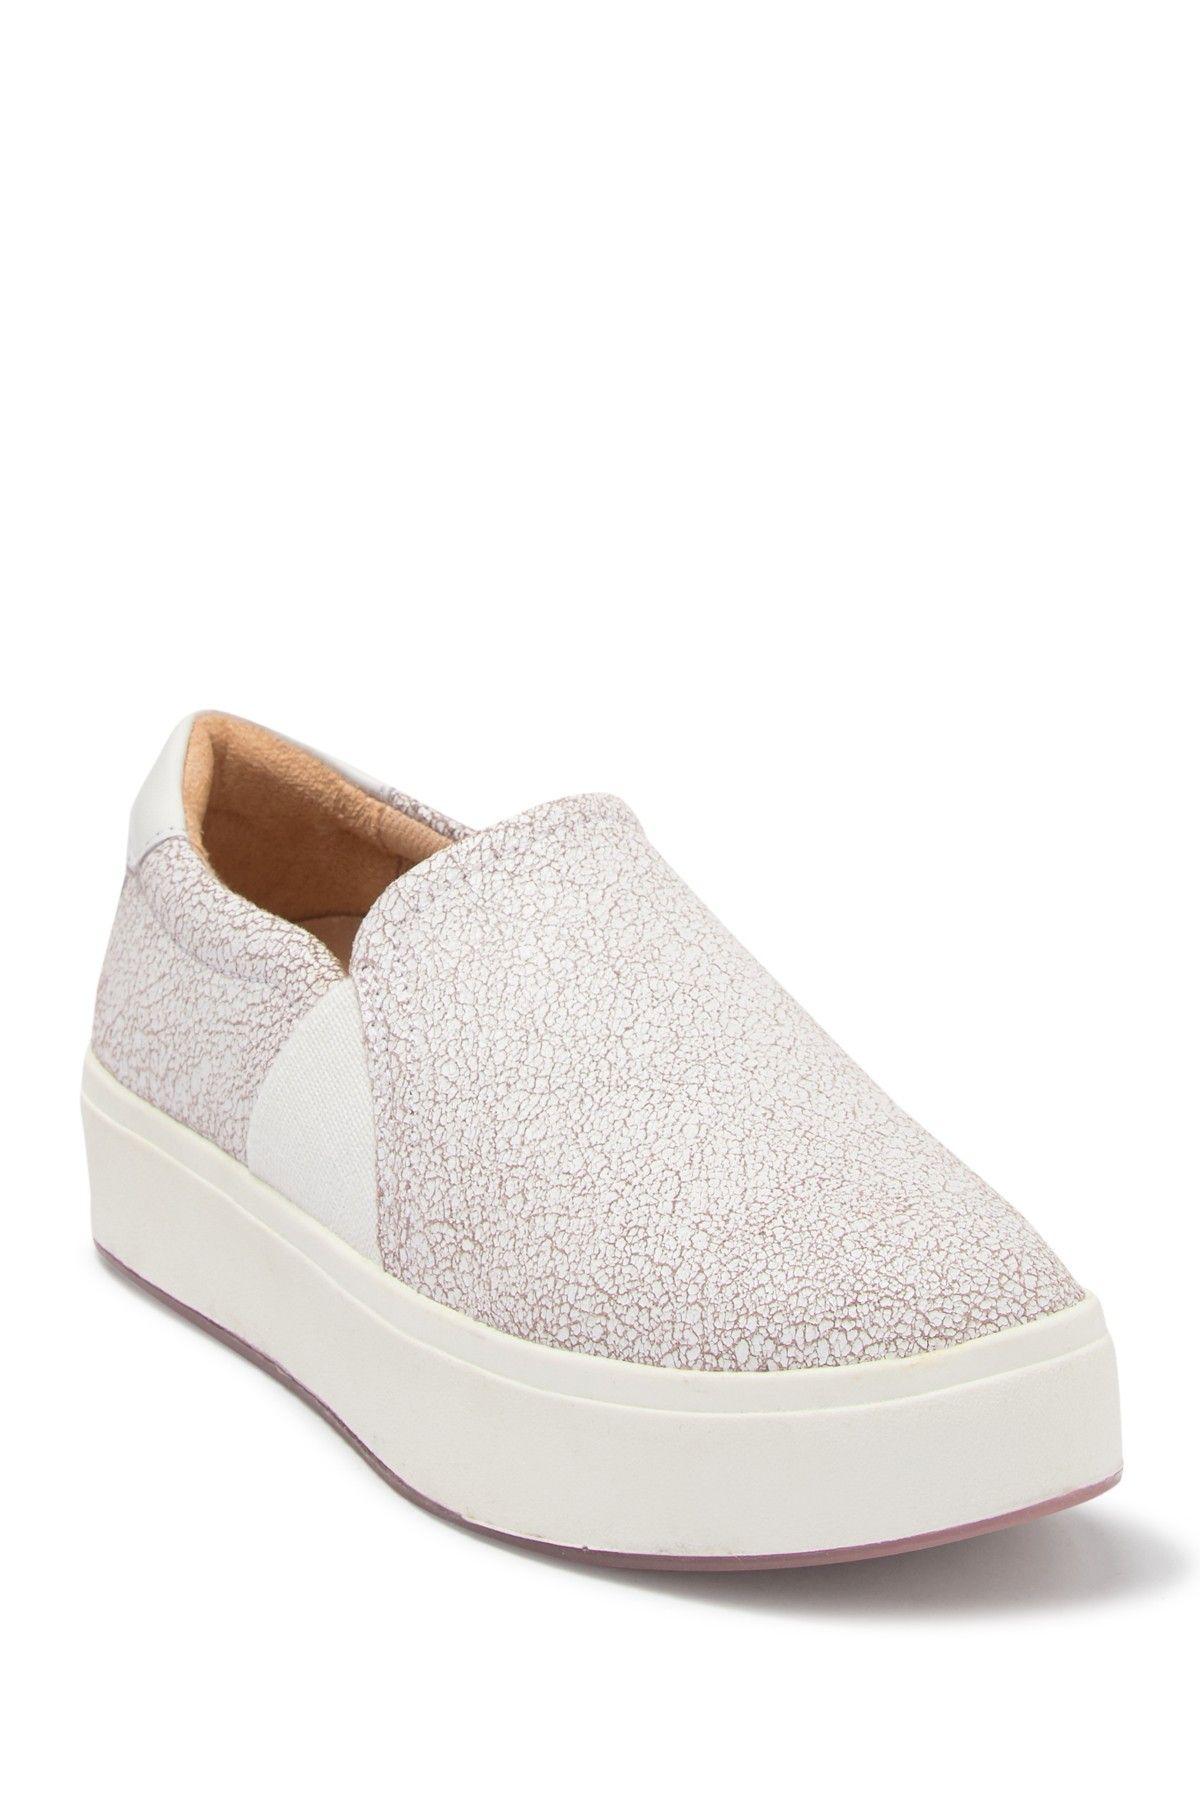 Dr. Scholl's Abbot Lux Slip-On Sneaker